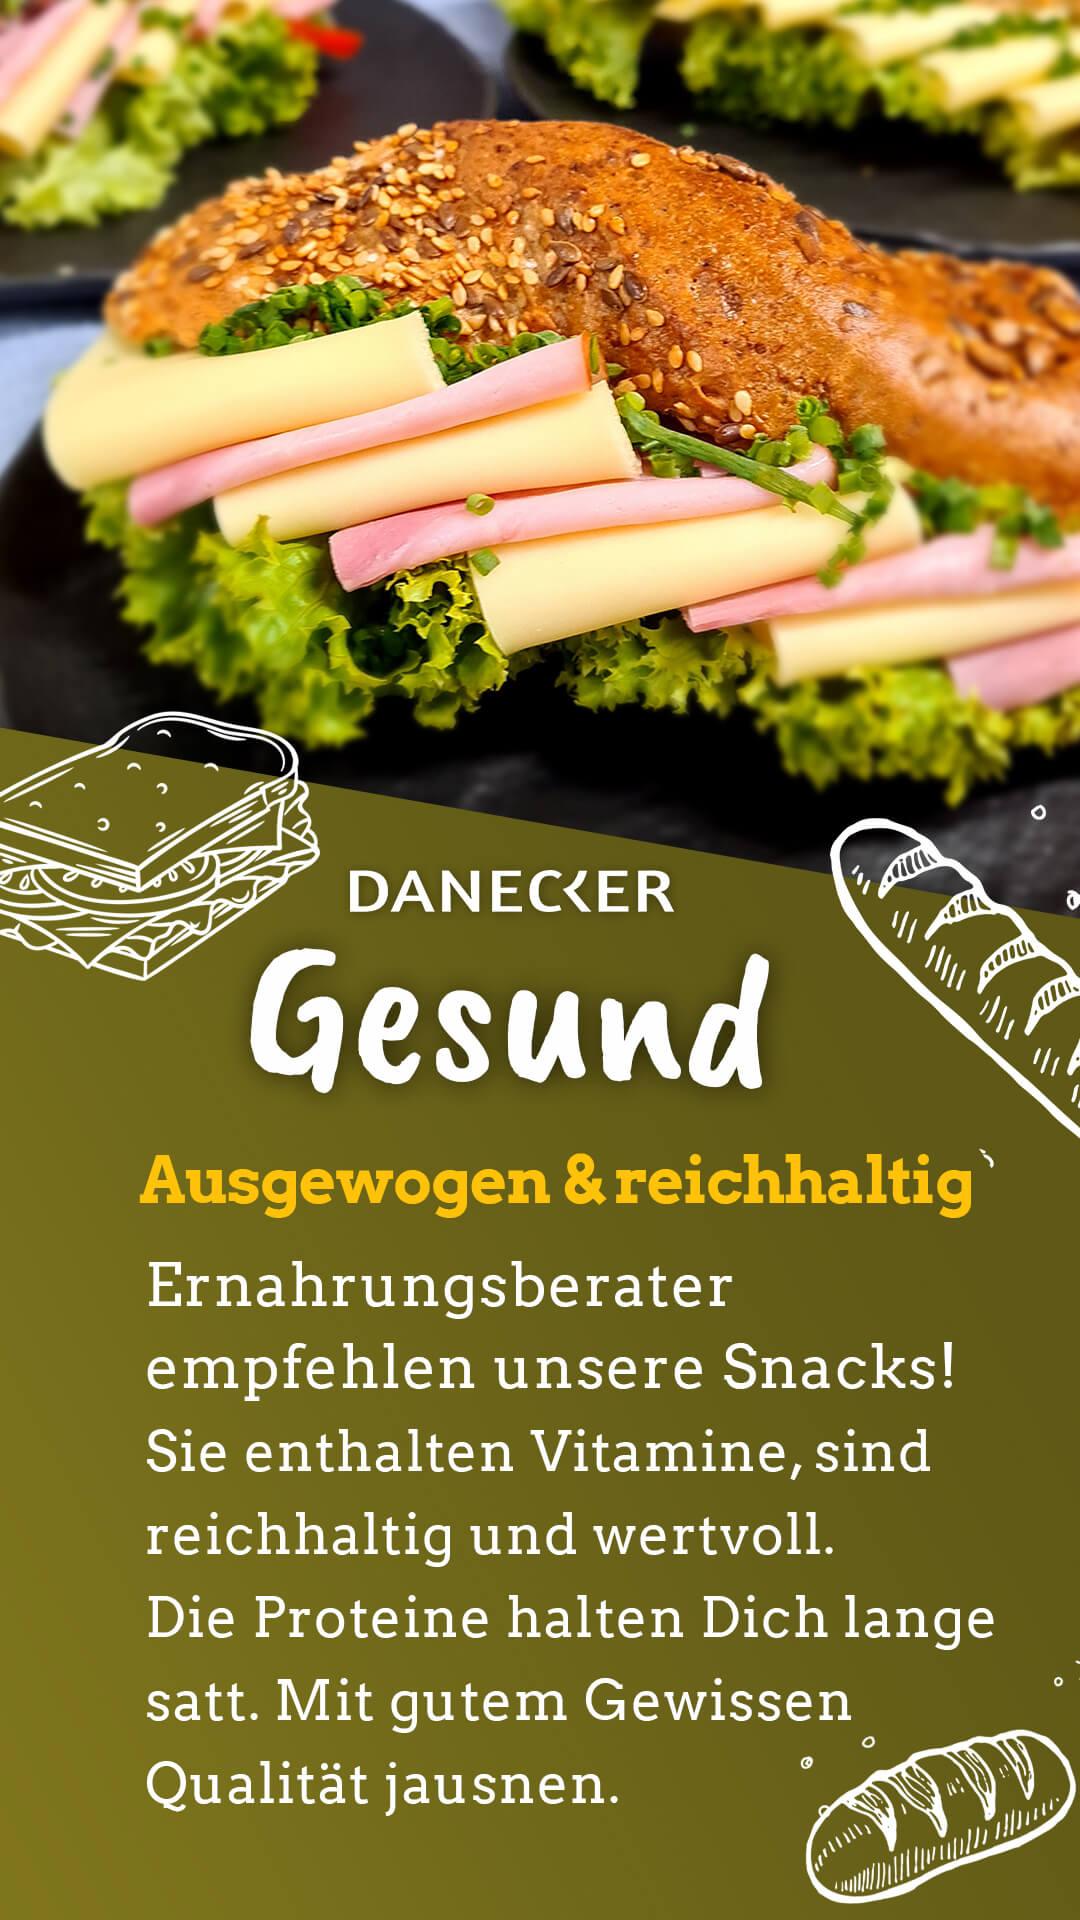 Snacks Jause Danecker Bäckerei Konditorei Amstetten Bahnhof, Allersdorf, Greinsfurth, Perg, Linz, Wallsee, Aschbach, Mauer